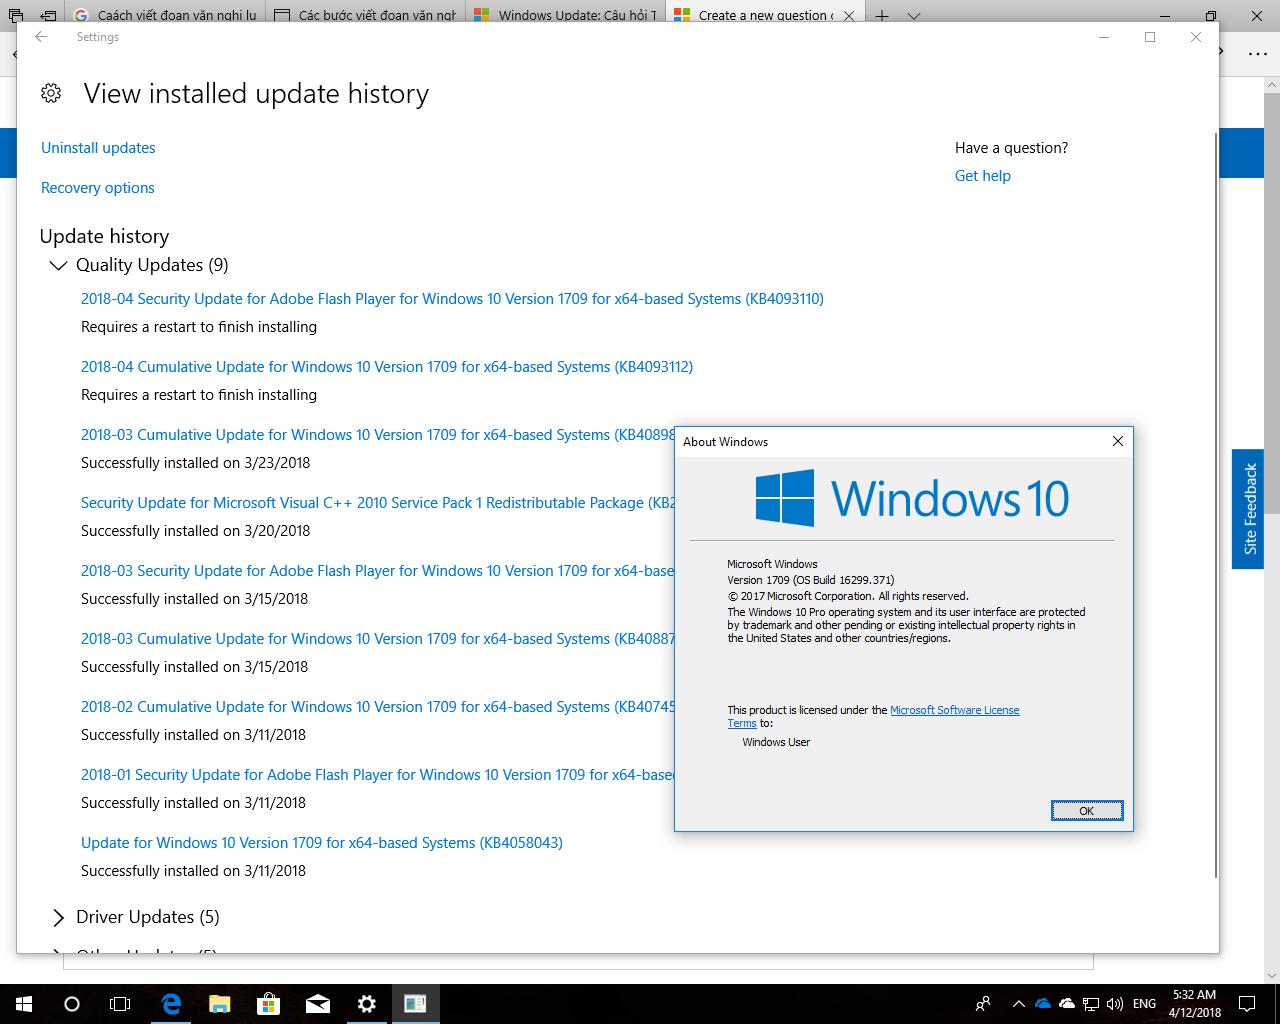 Windows Update reported